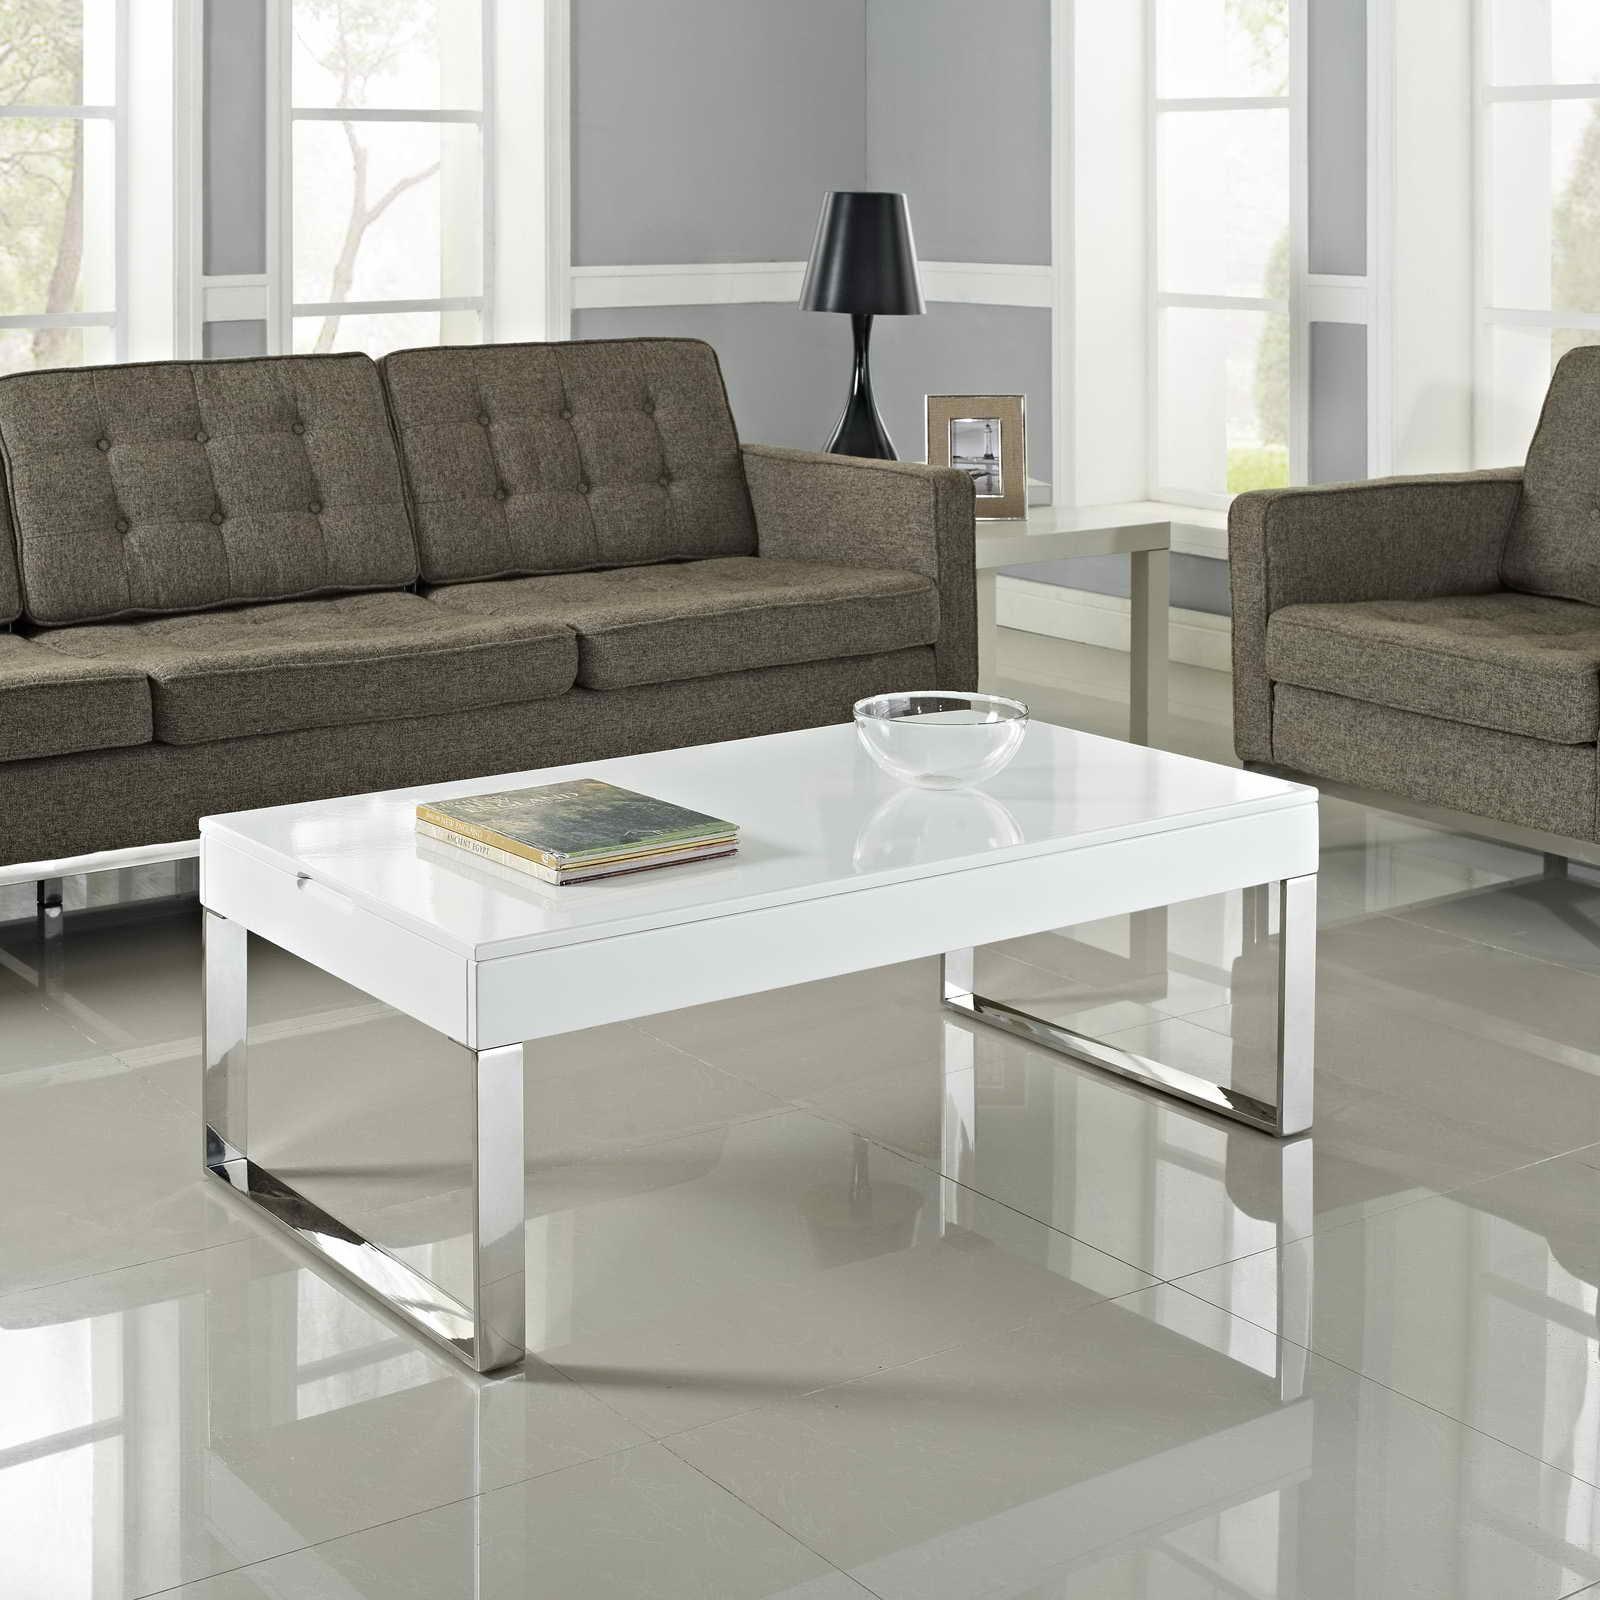 Amazing Lucite Coffee Table Ikea - HomesFeed